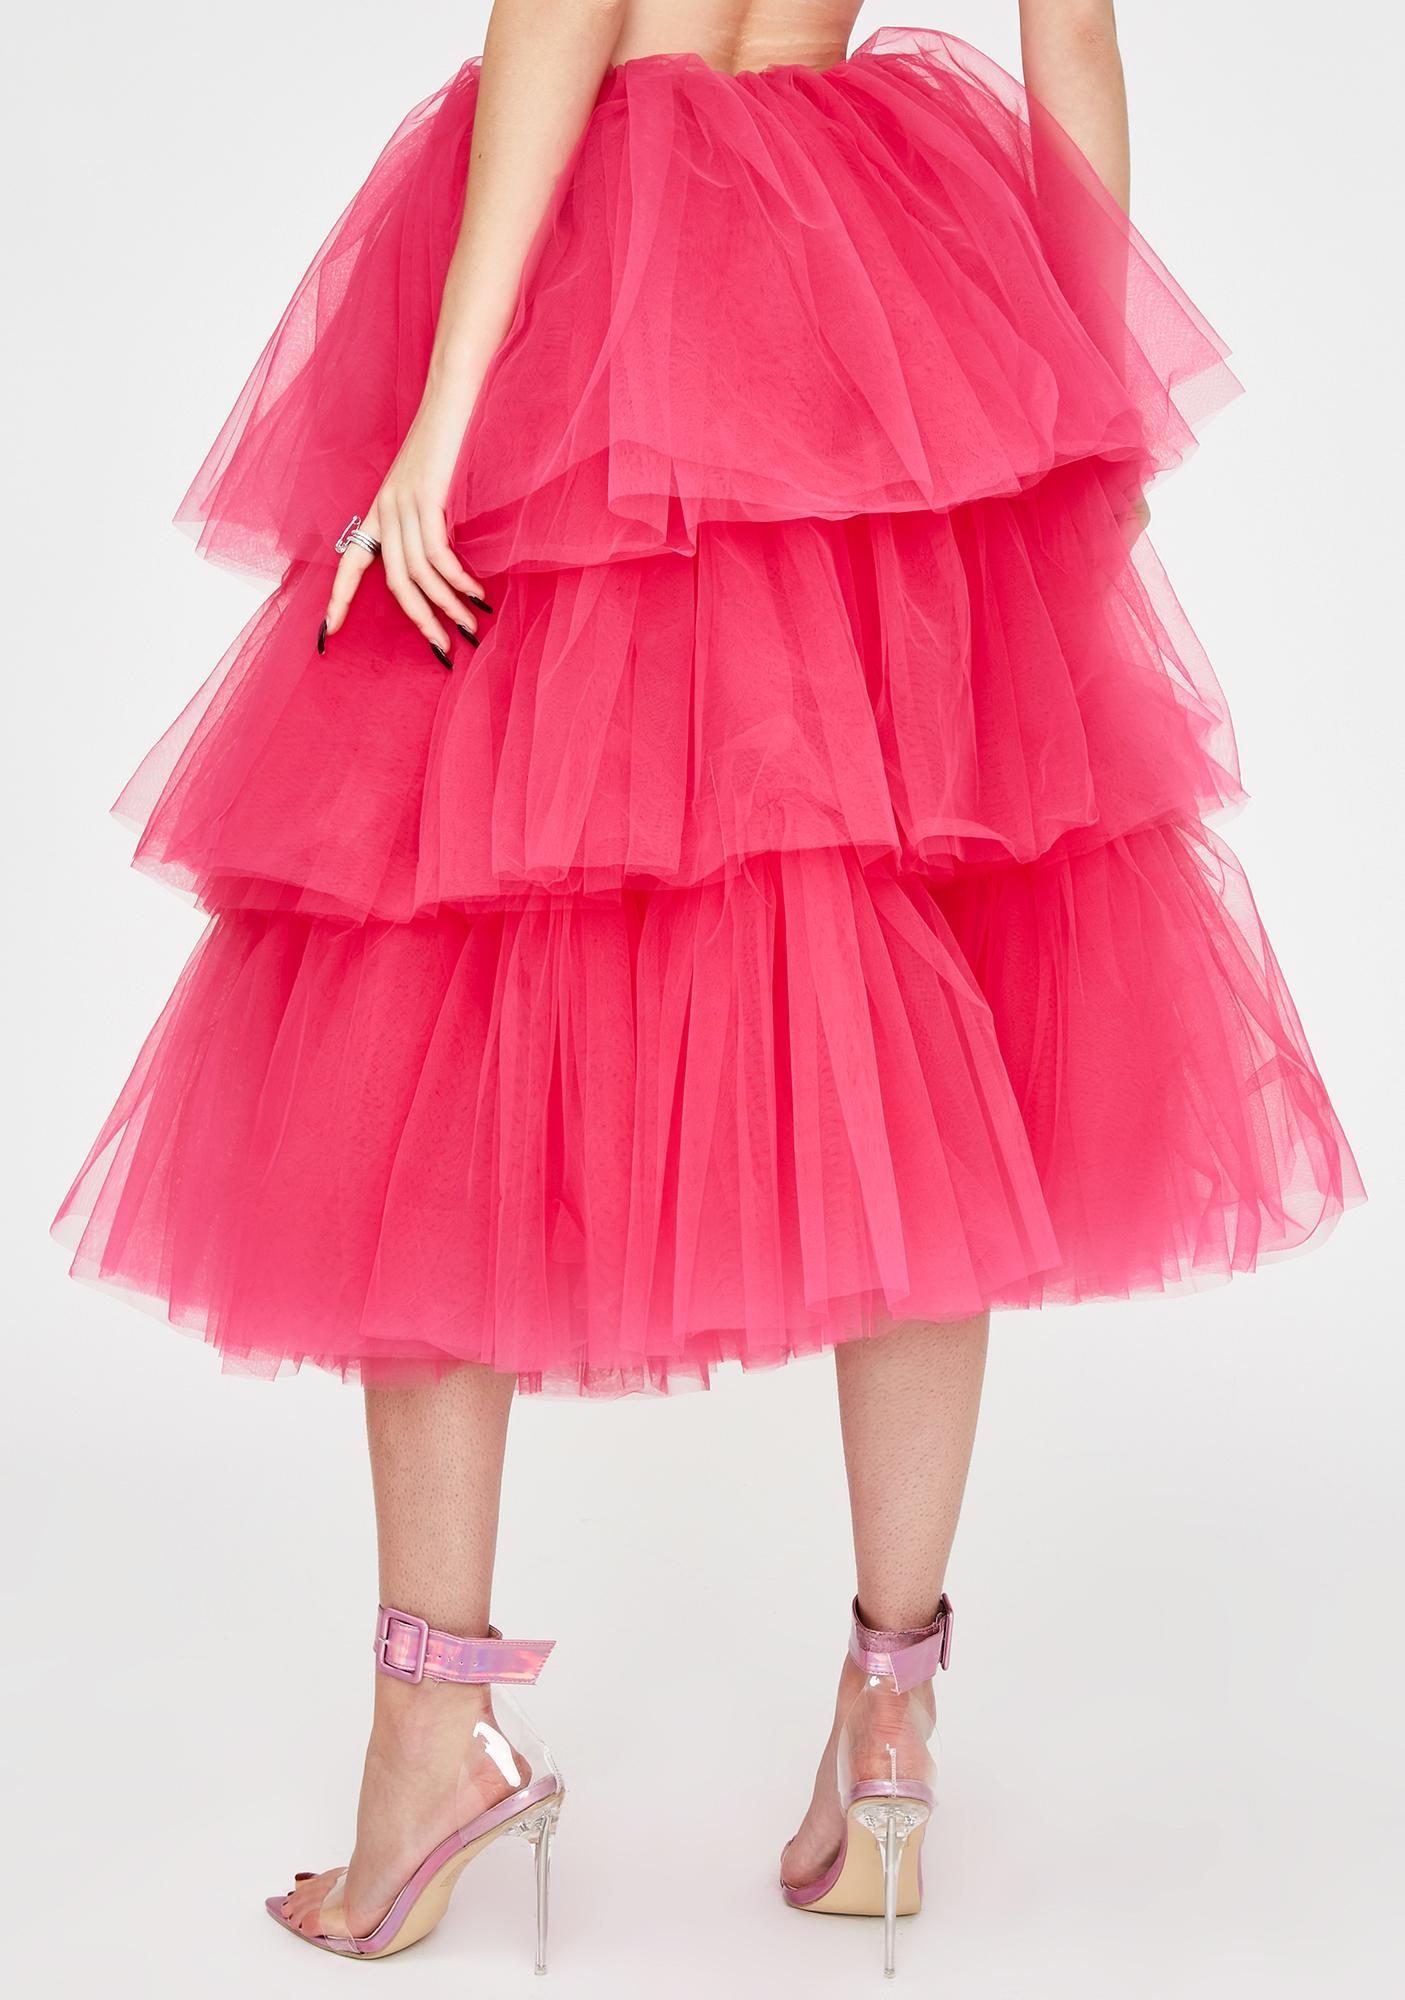 Kiki Riki Fad Status Tulle Skirt